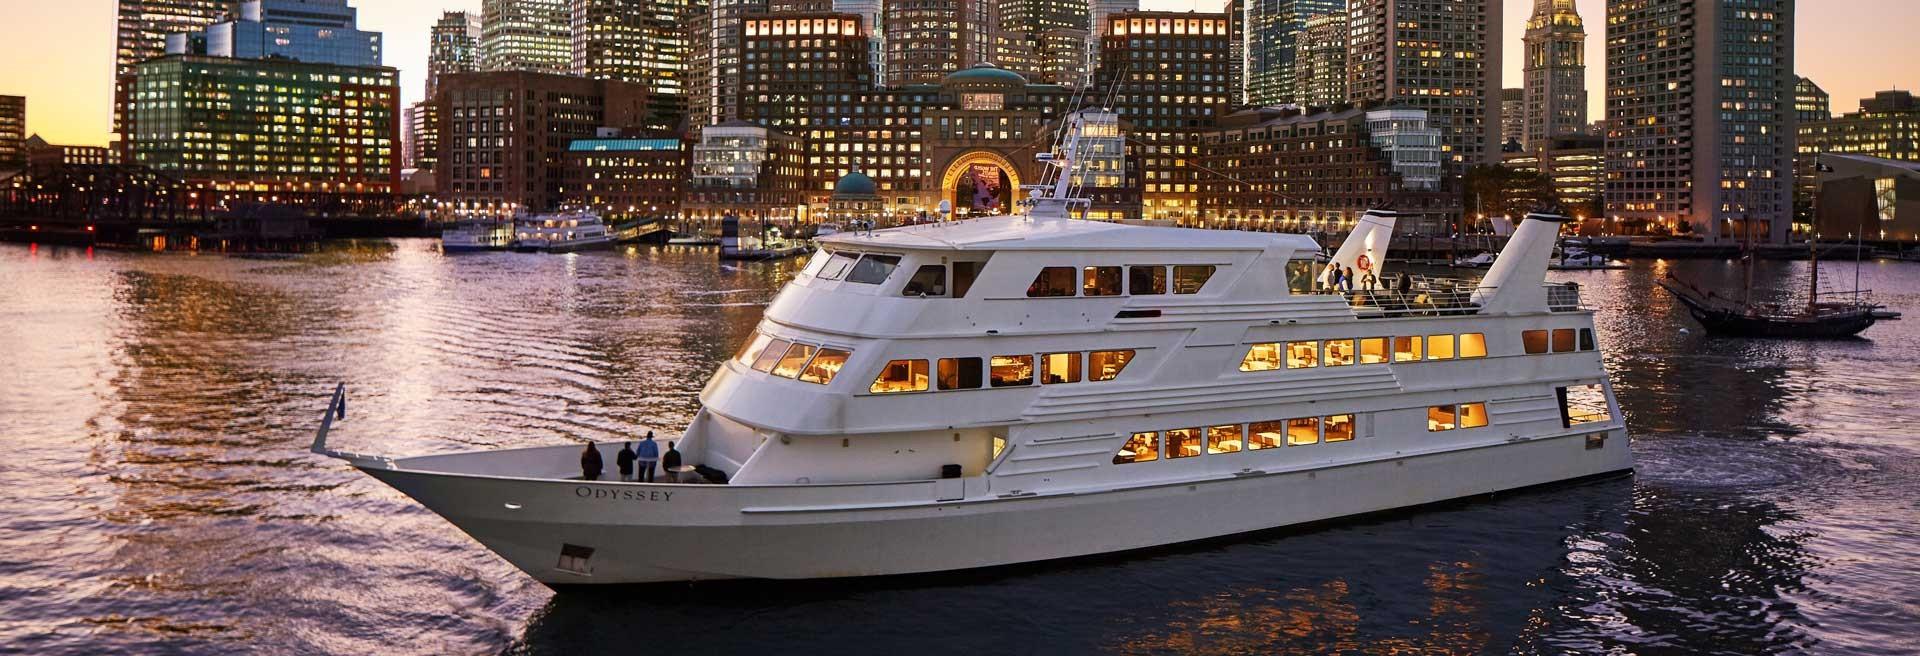 Boston Harbor Dinner Cruises  Boston Harbor Views Great Dining and Entertainment